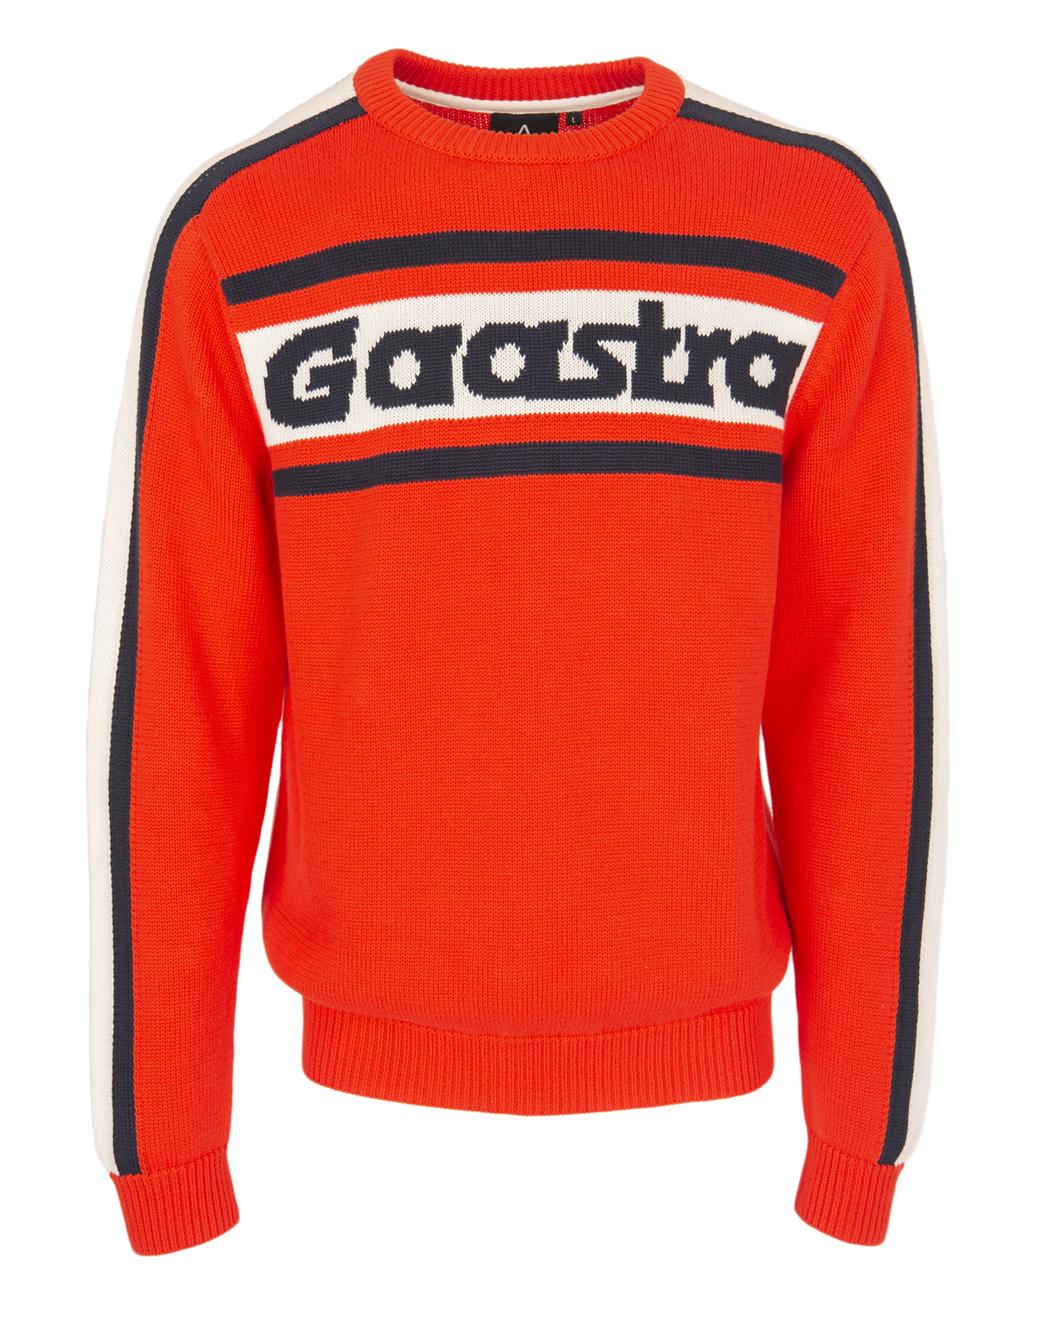 Beam sweater with logo